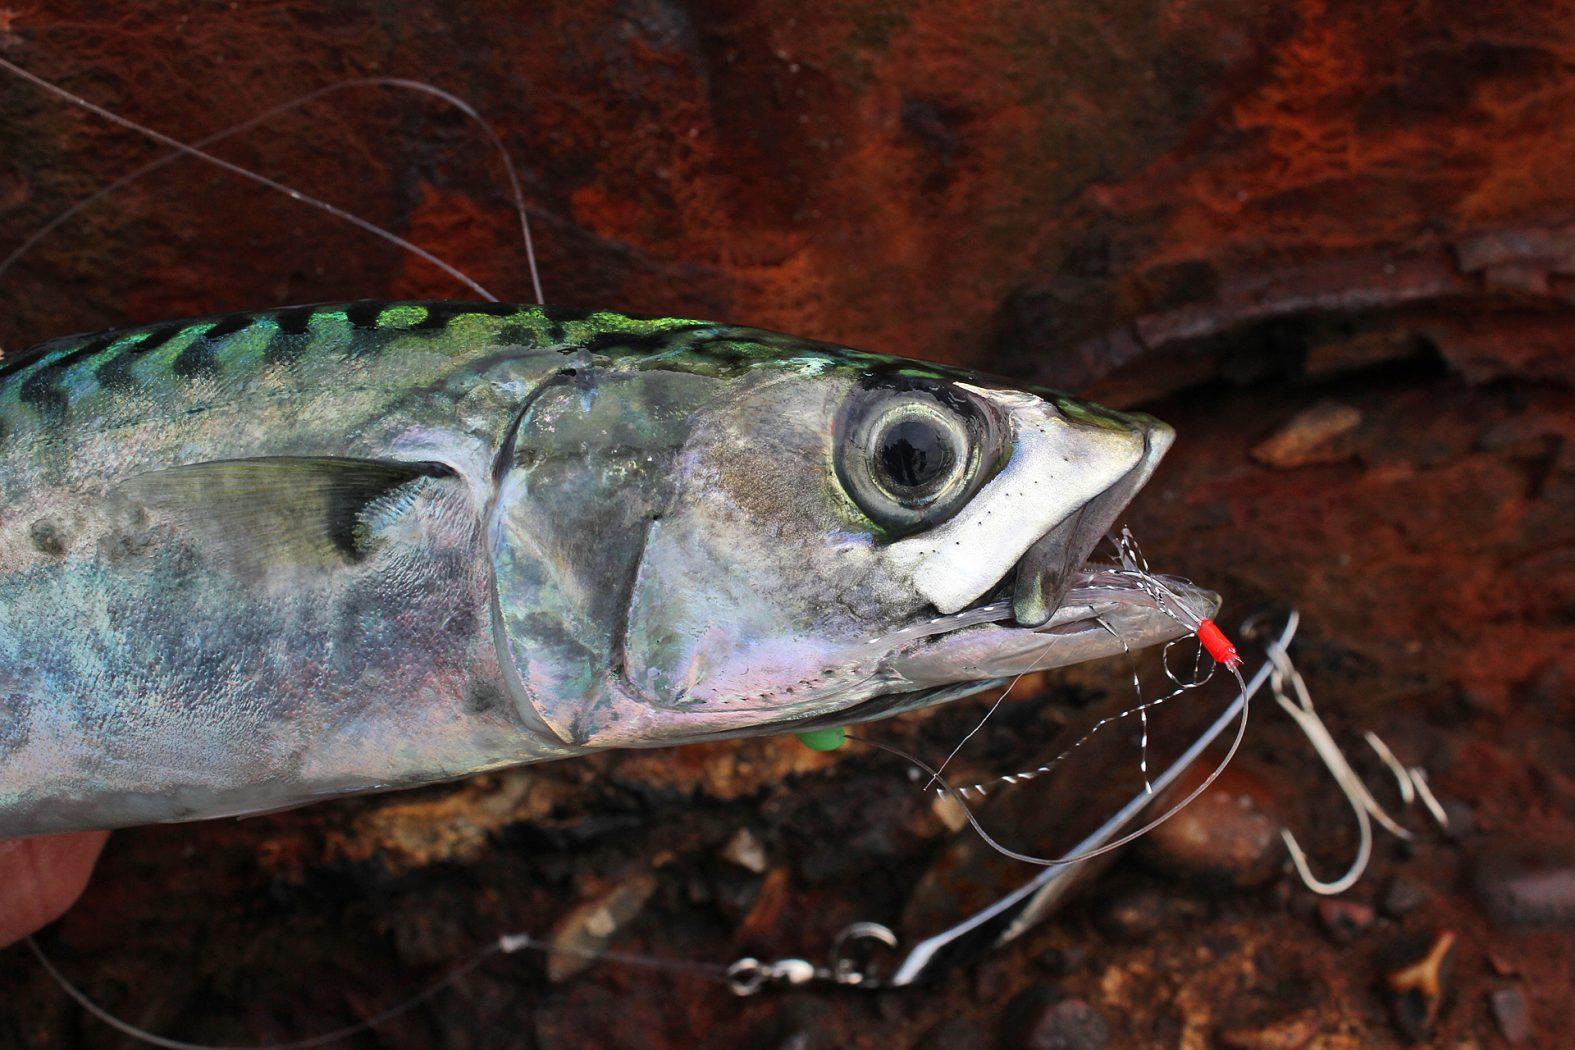 Makrelen angeln in Dänemark